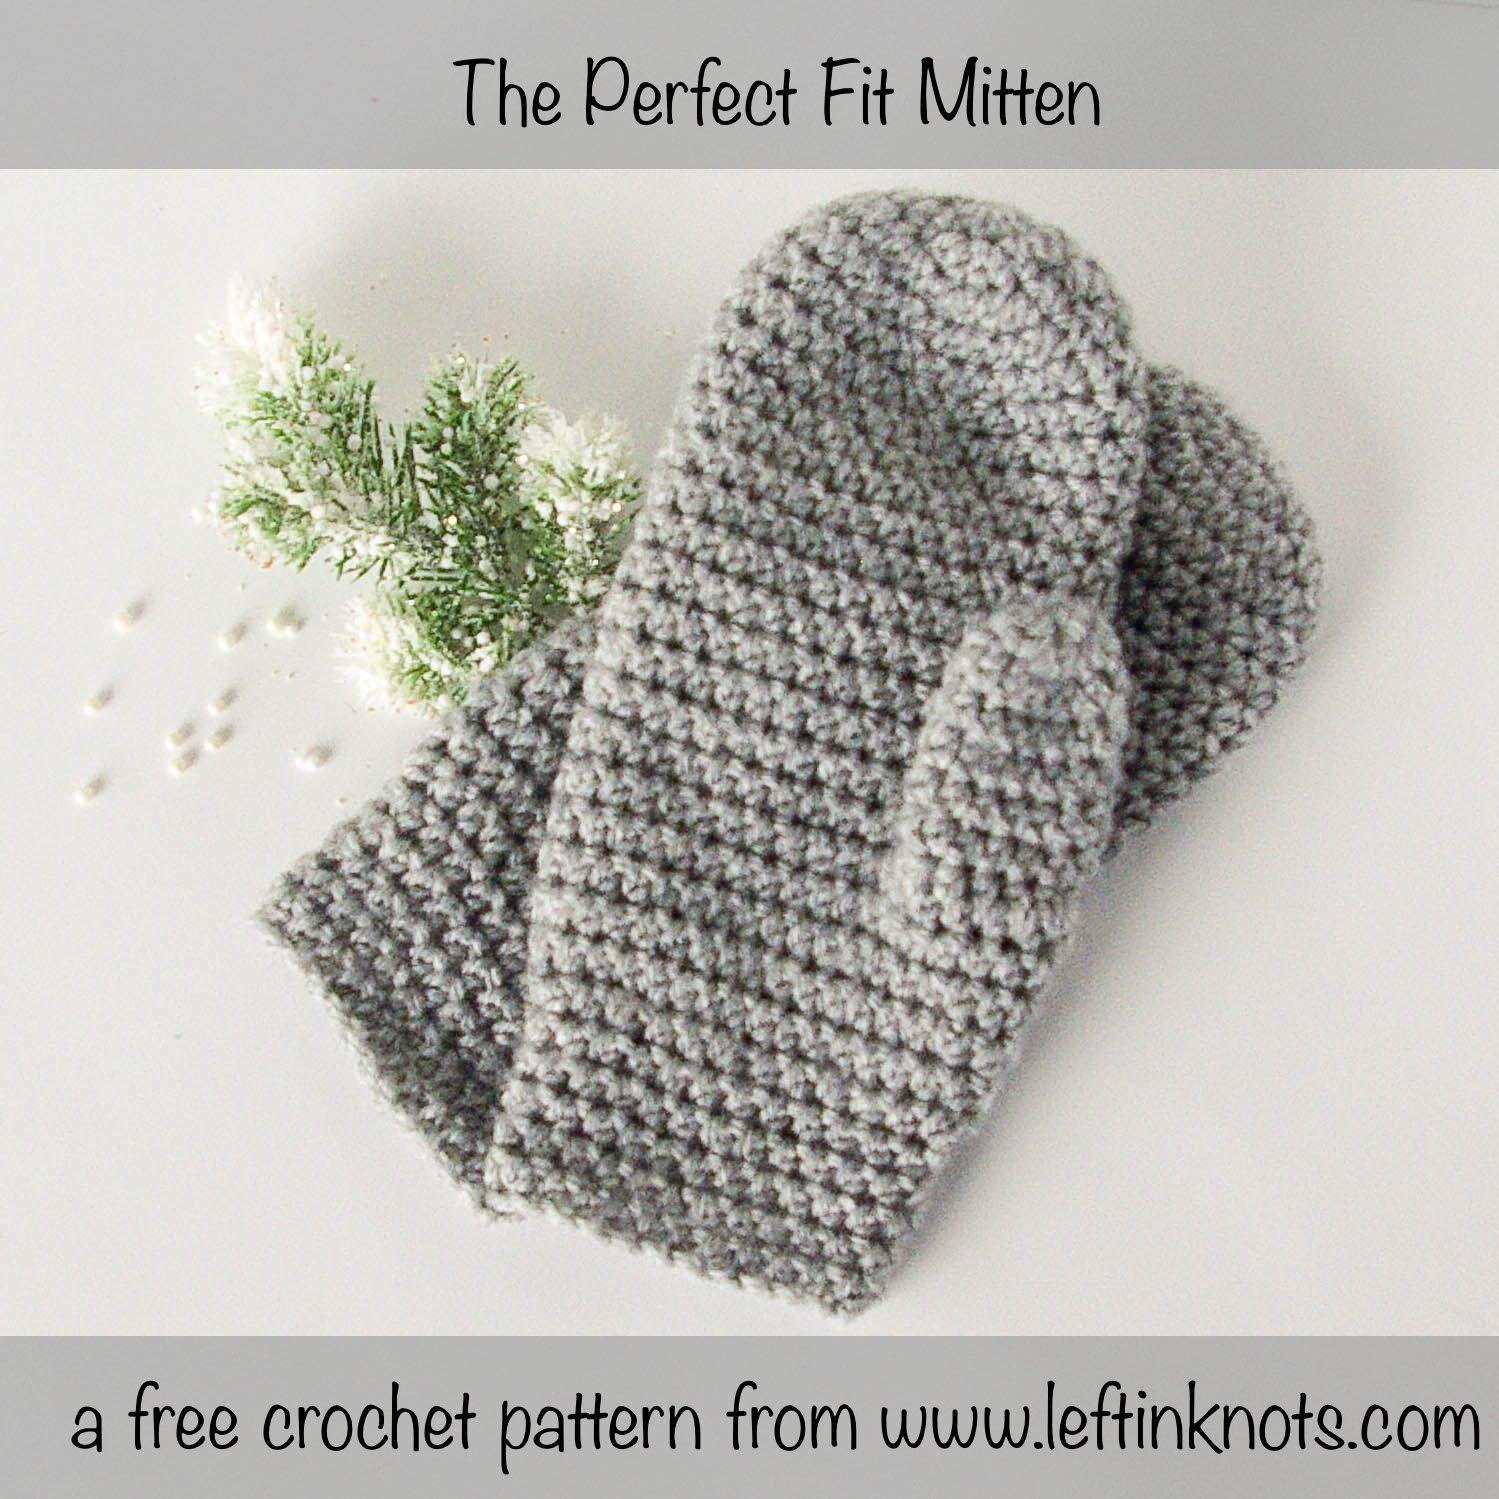 The Perfect Fit Mitten | Guantes, Tejido y Bordado